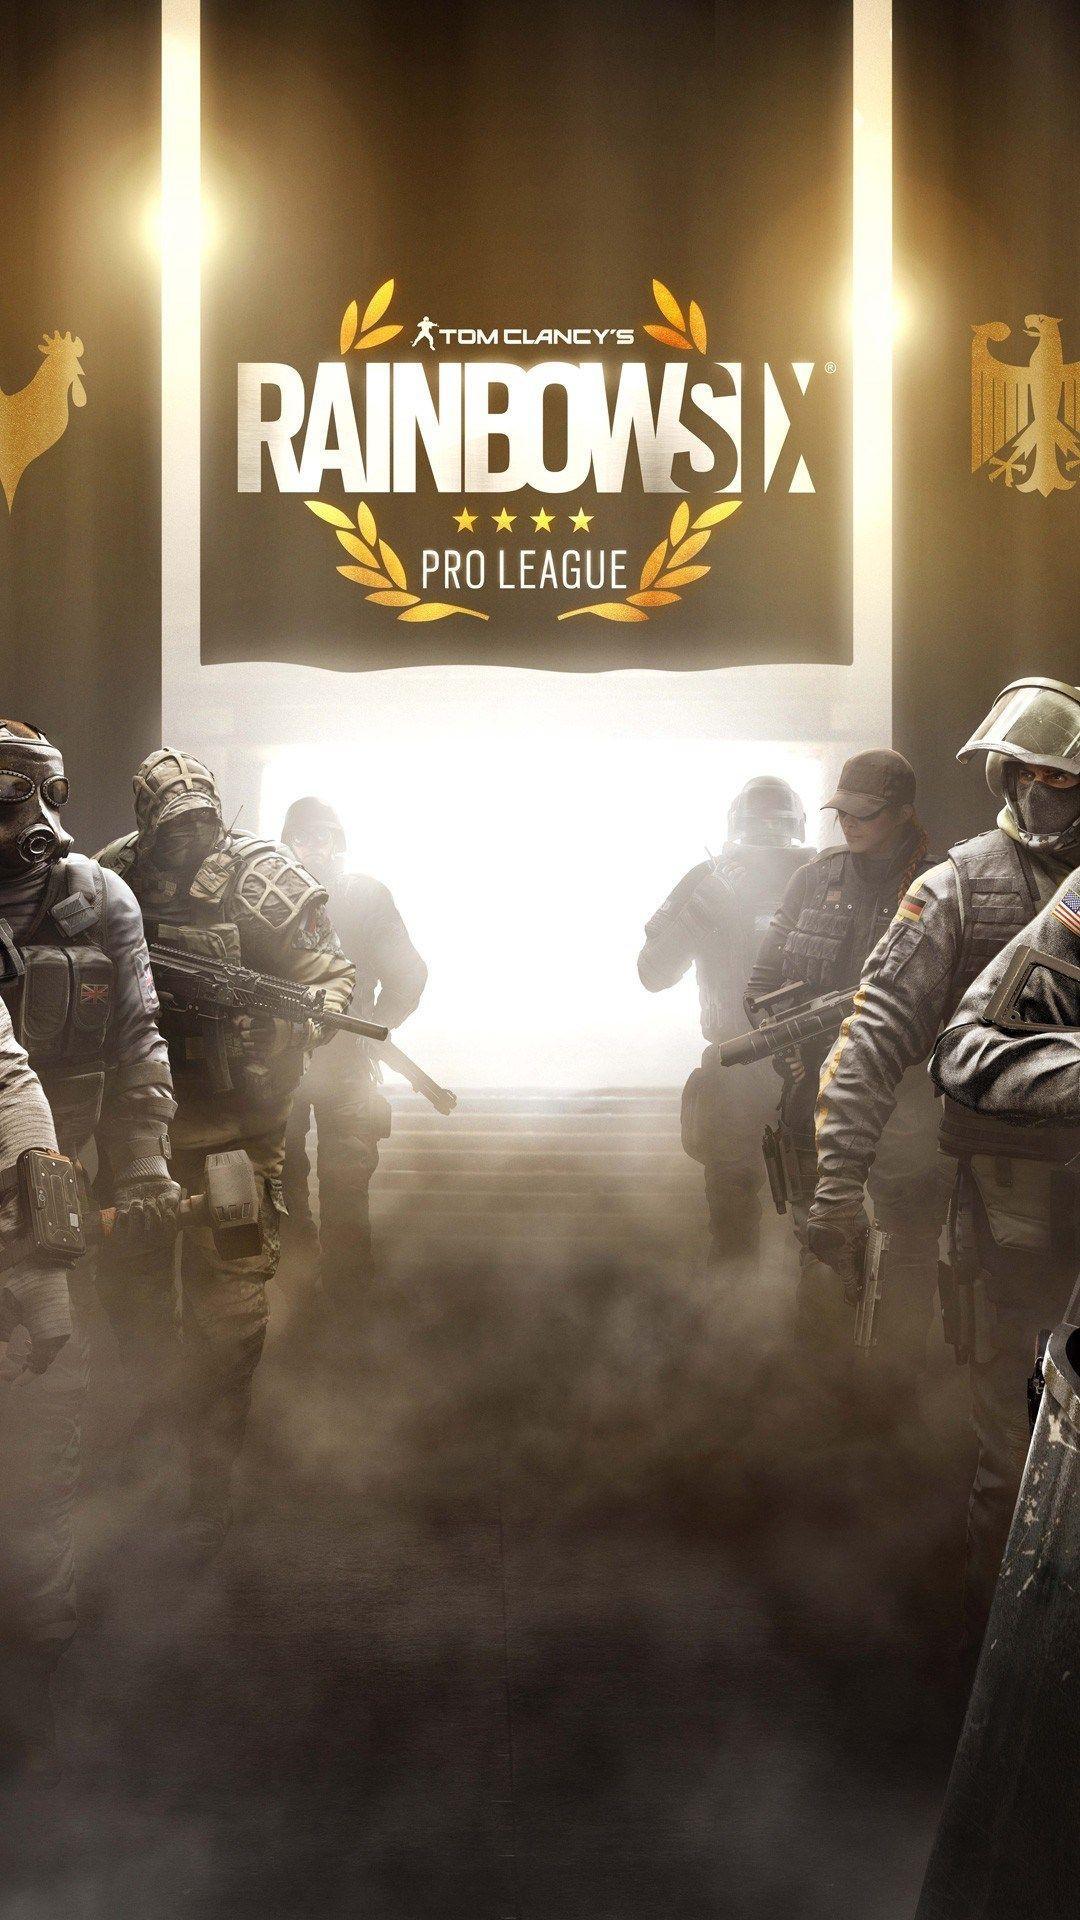 Unduh 5000+ Wallpaper Android Rainbow Six Siege  Terbaru